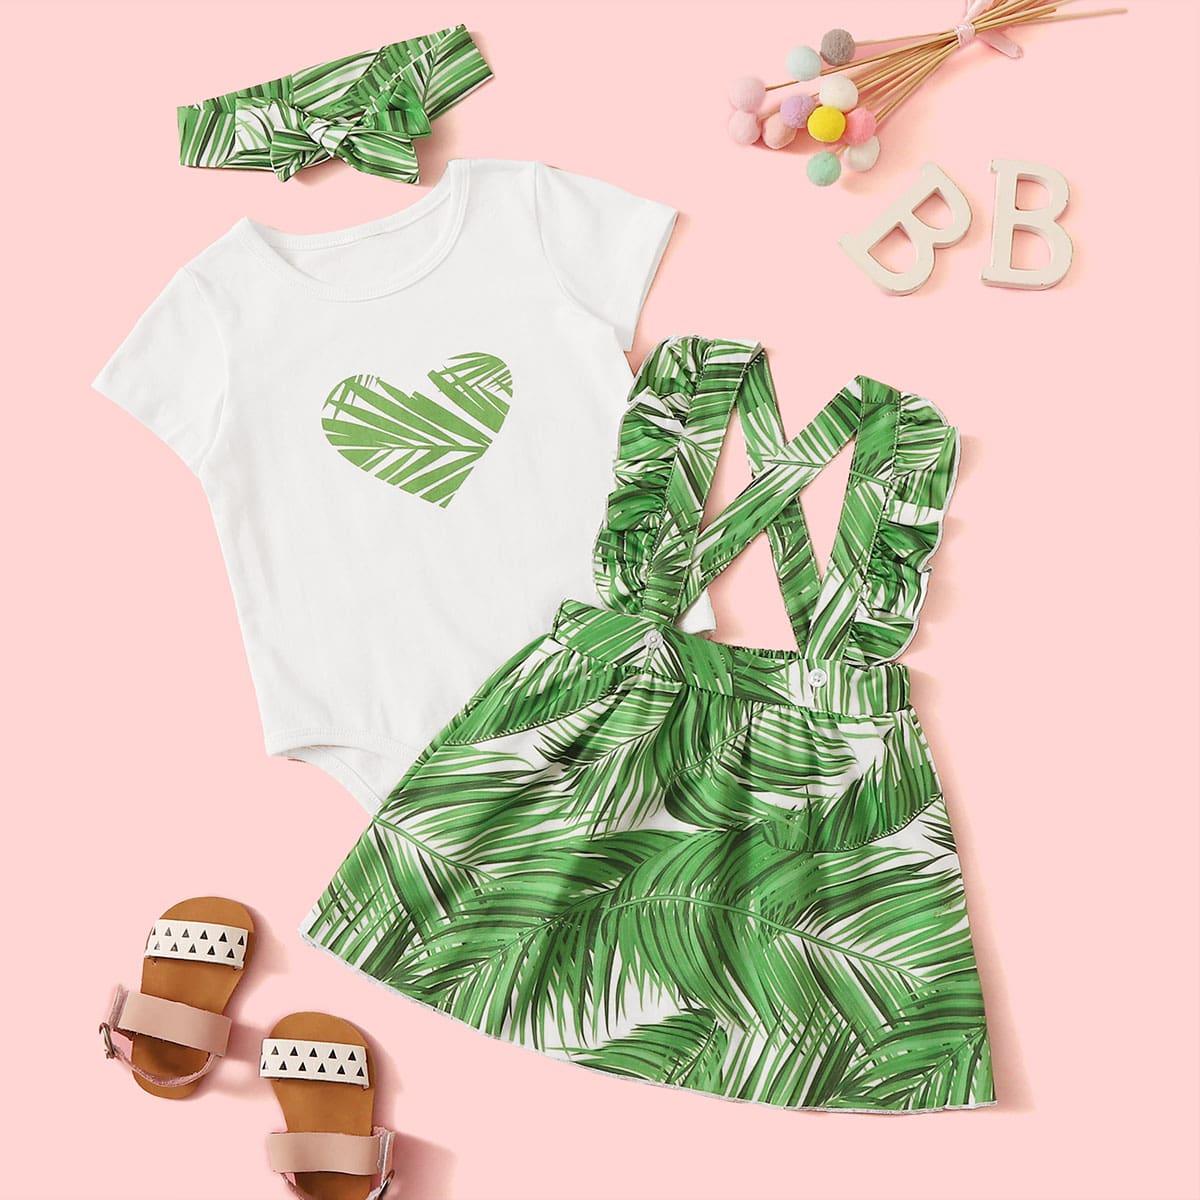 SHEIN / Baby Girl Tropical Print Romper & Ruffle Trim Skirt & Headband